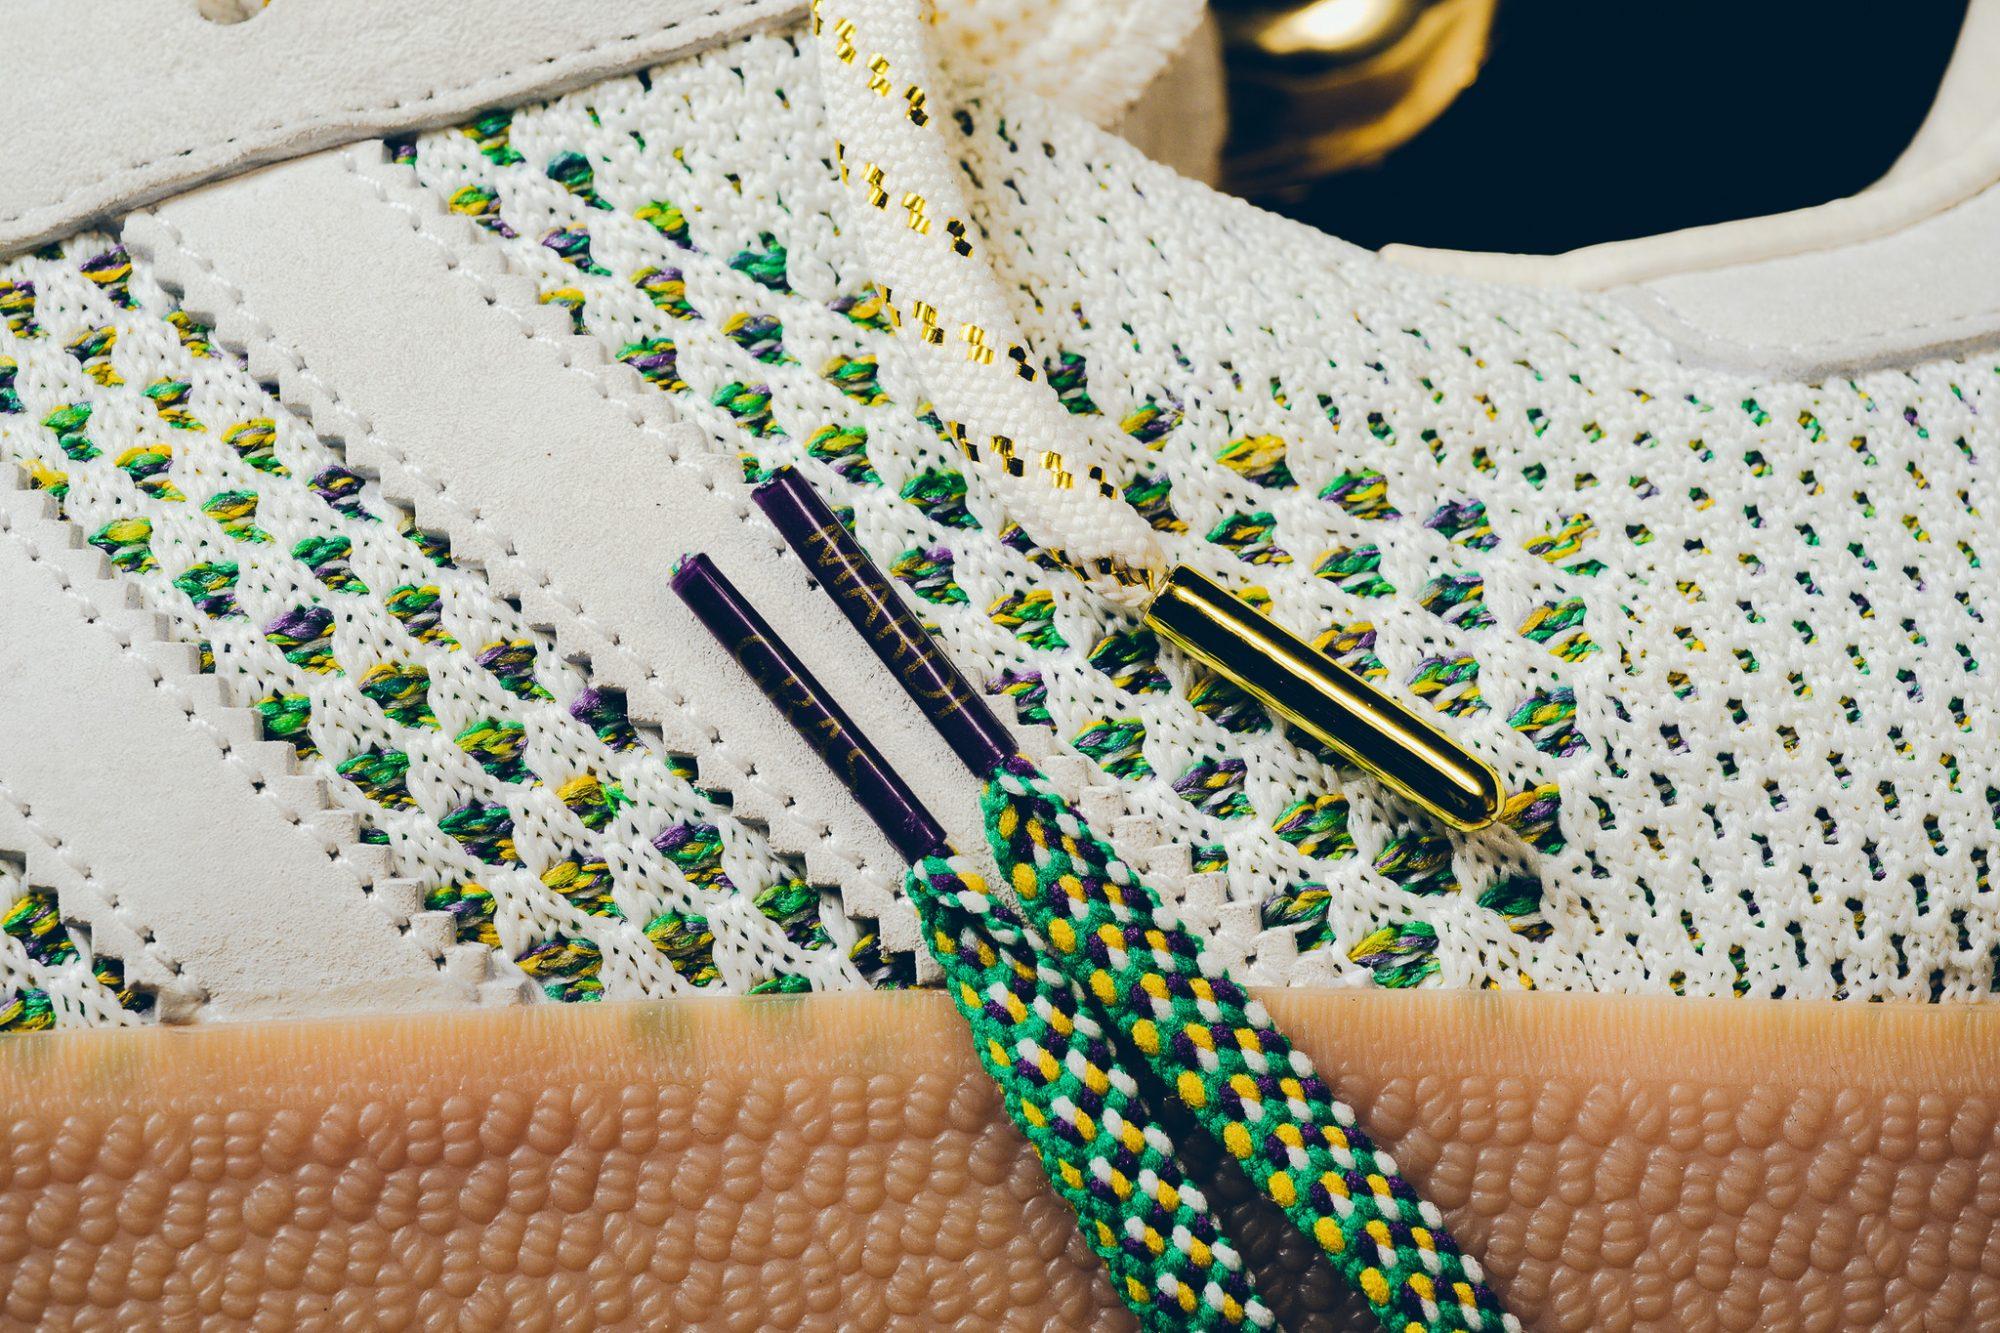 Sneaker_Politics_x_Adidas_Consortium_Gazelle_Primeknit_Mardi_Gras_13